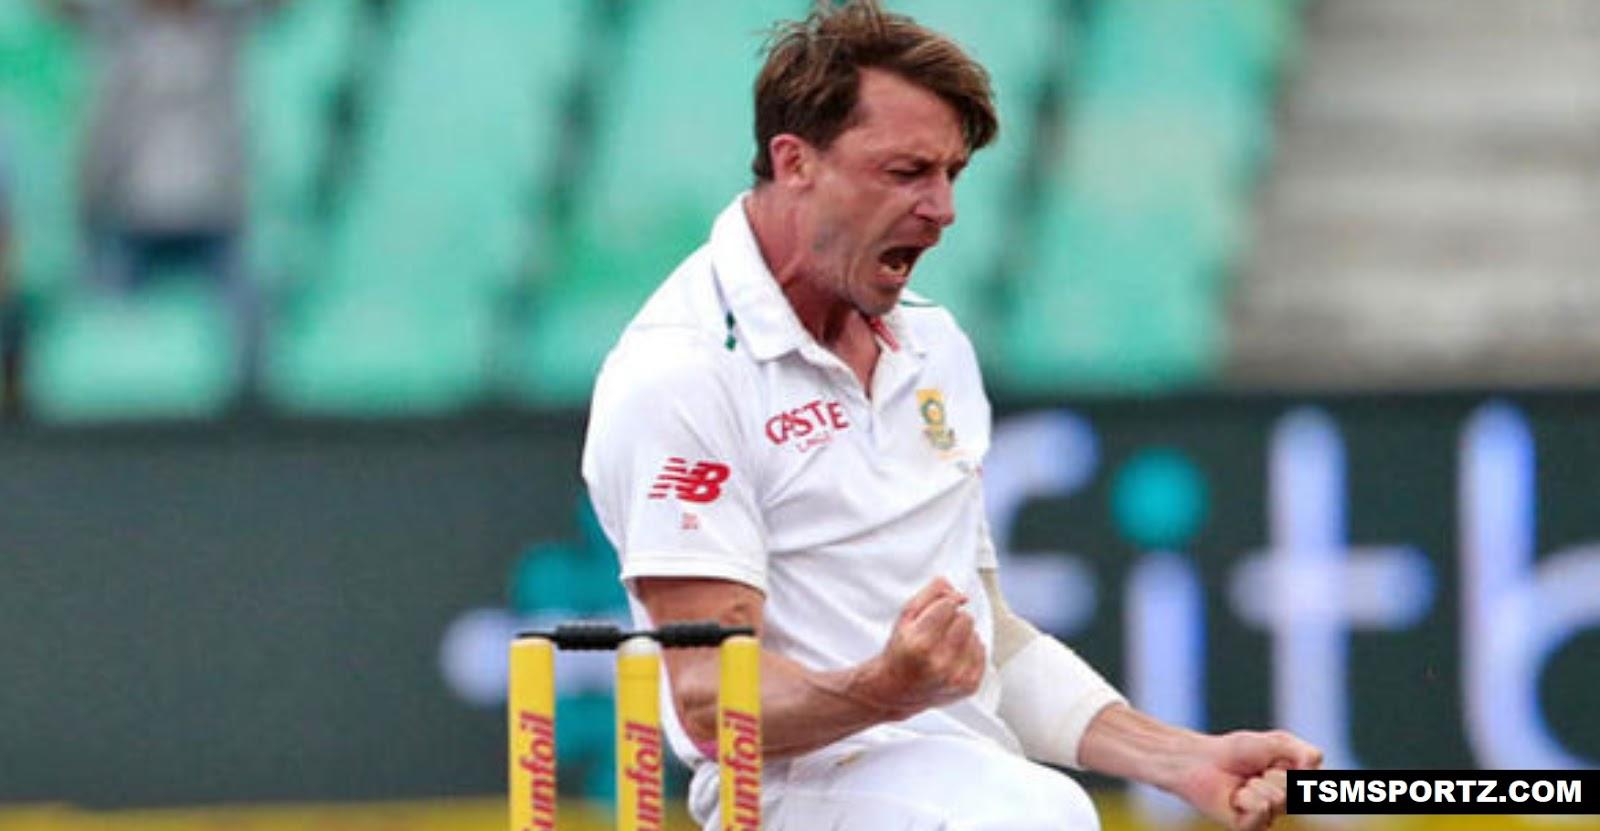 Dale Steyn fastest bowler in cricket